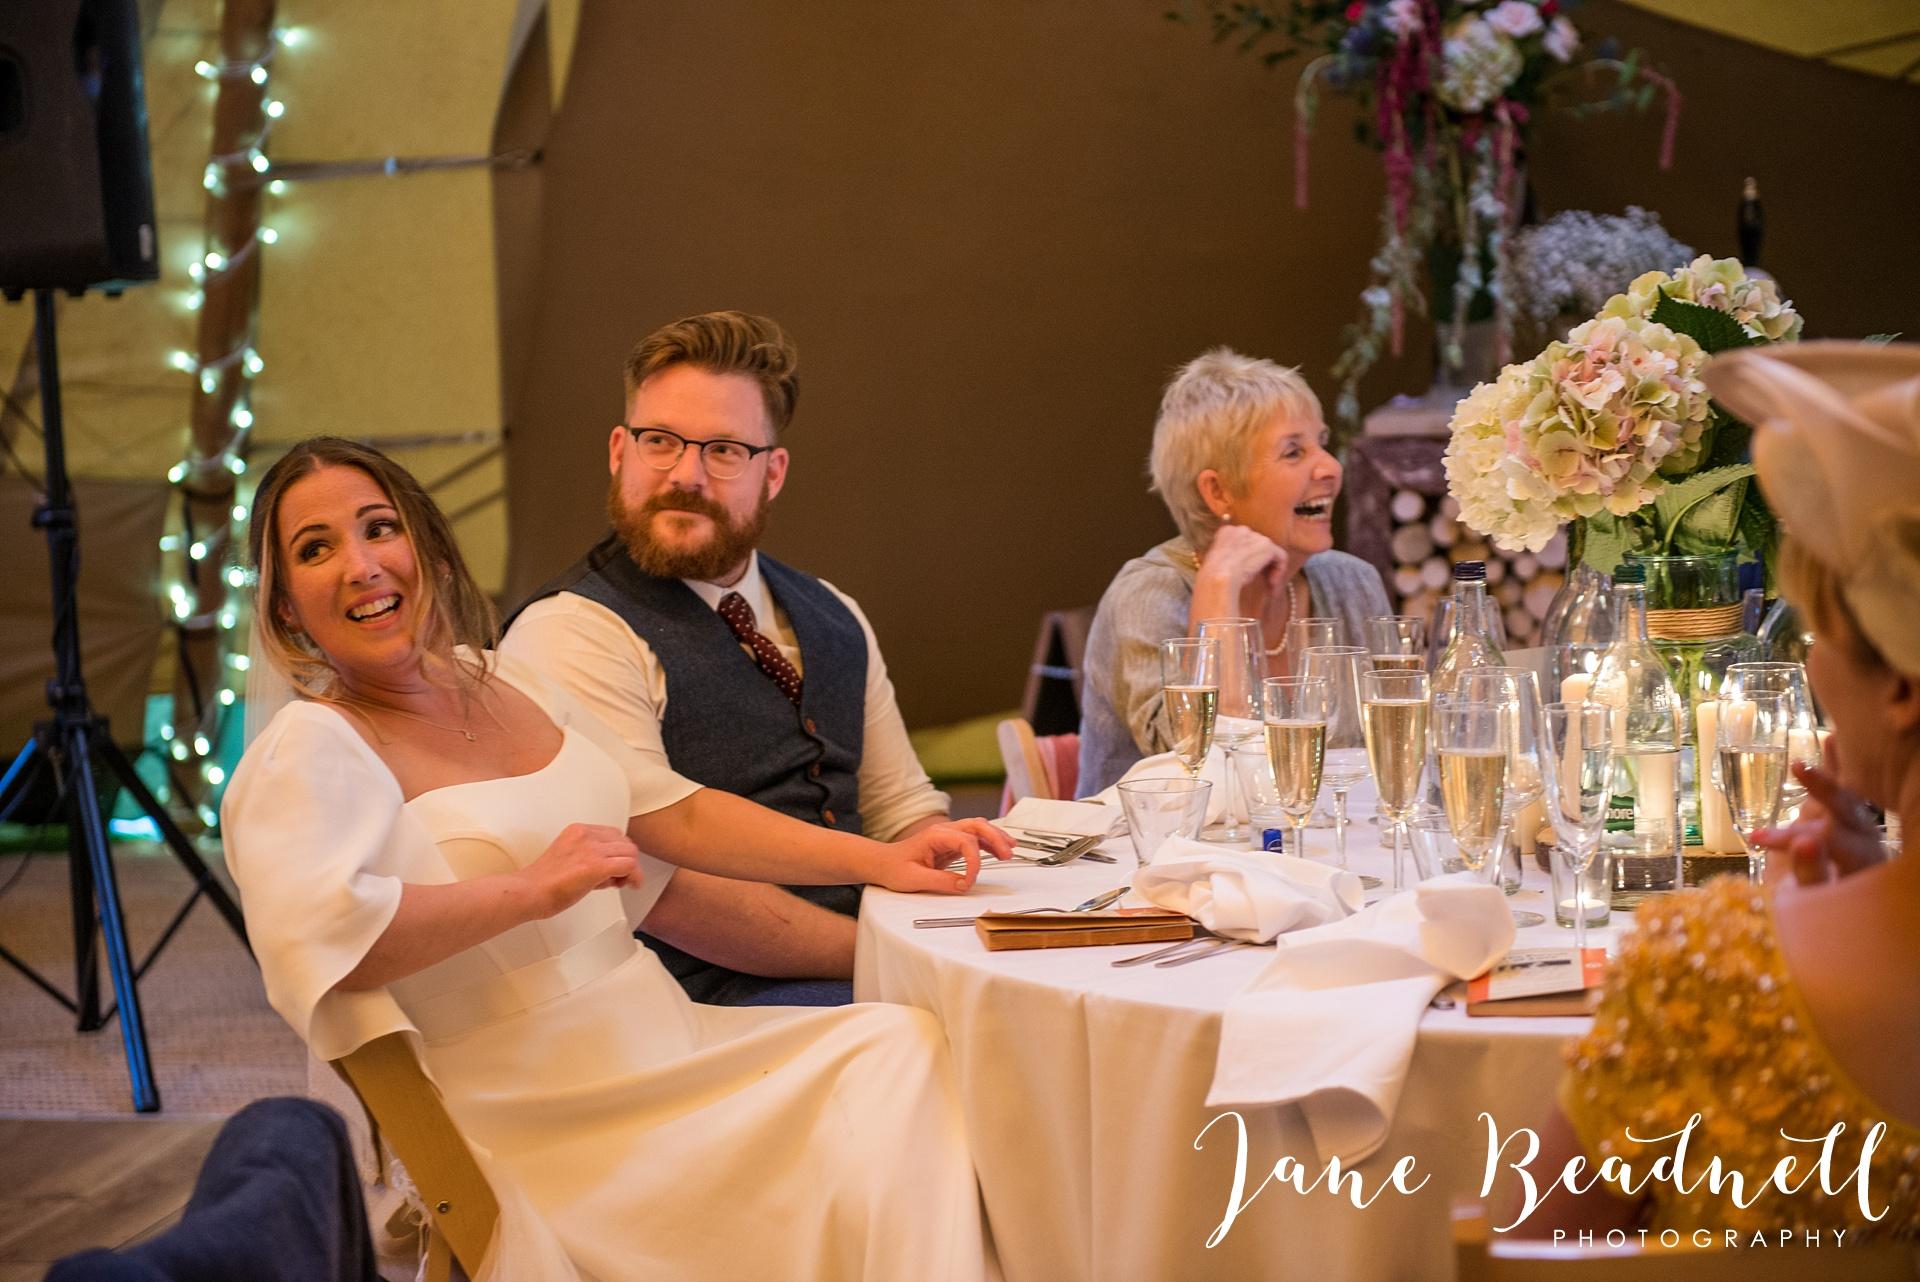 fine-art-wedding-photographer-jane-beadnell-yorkshire-wedding-photographer_0133